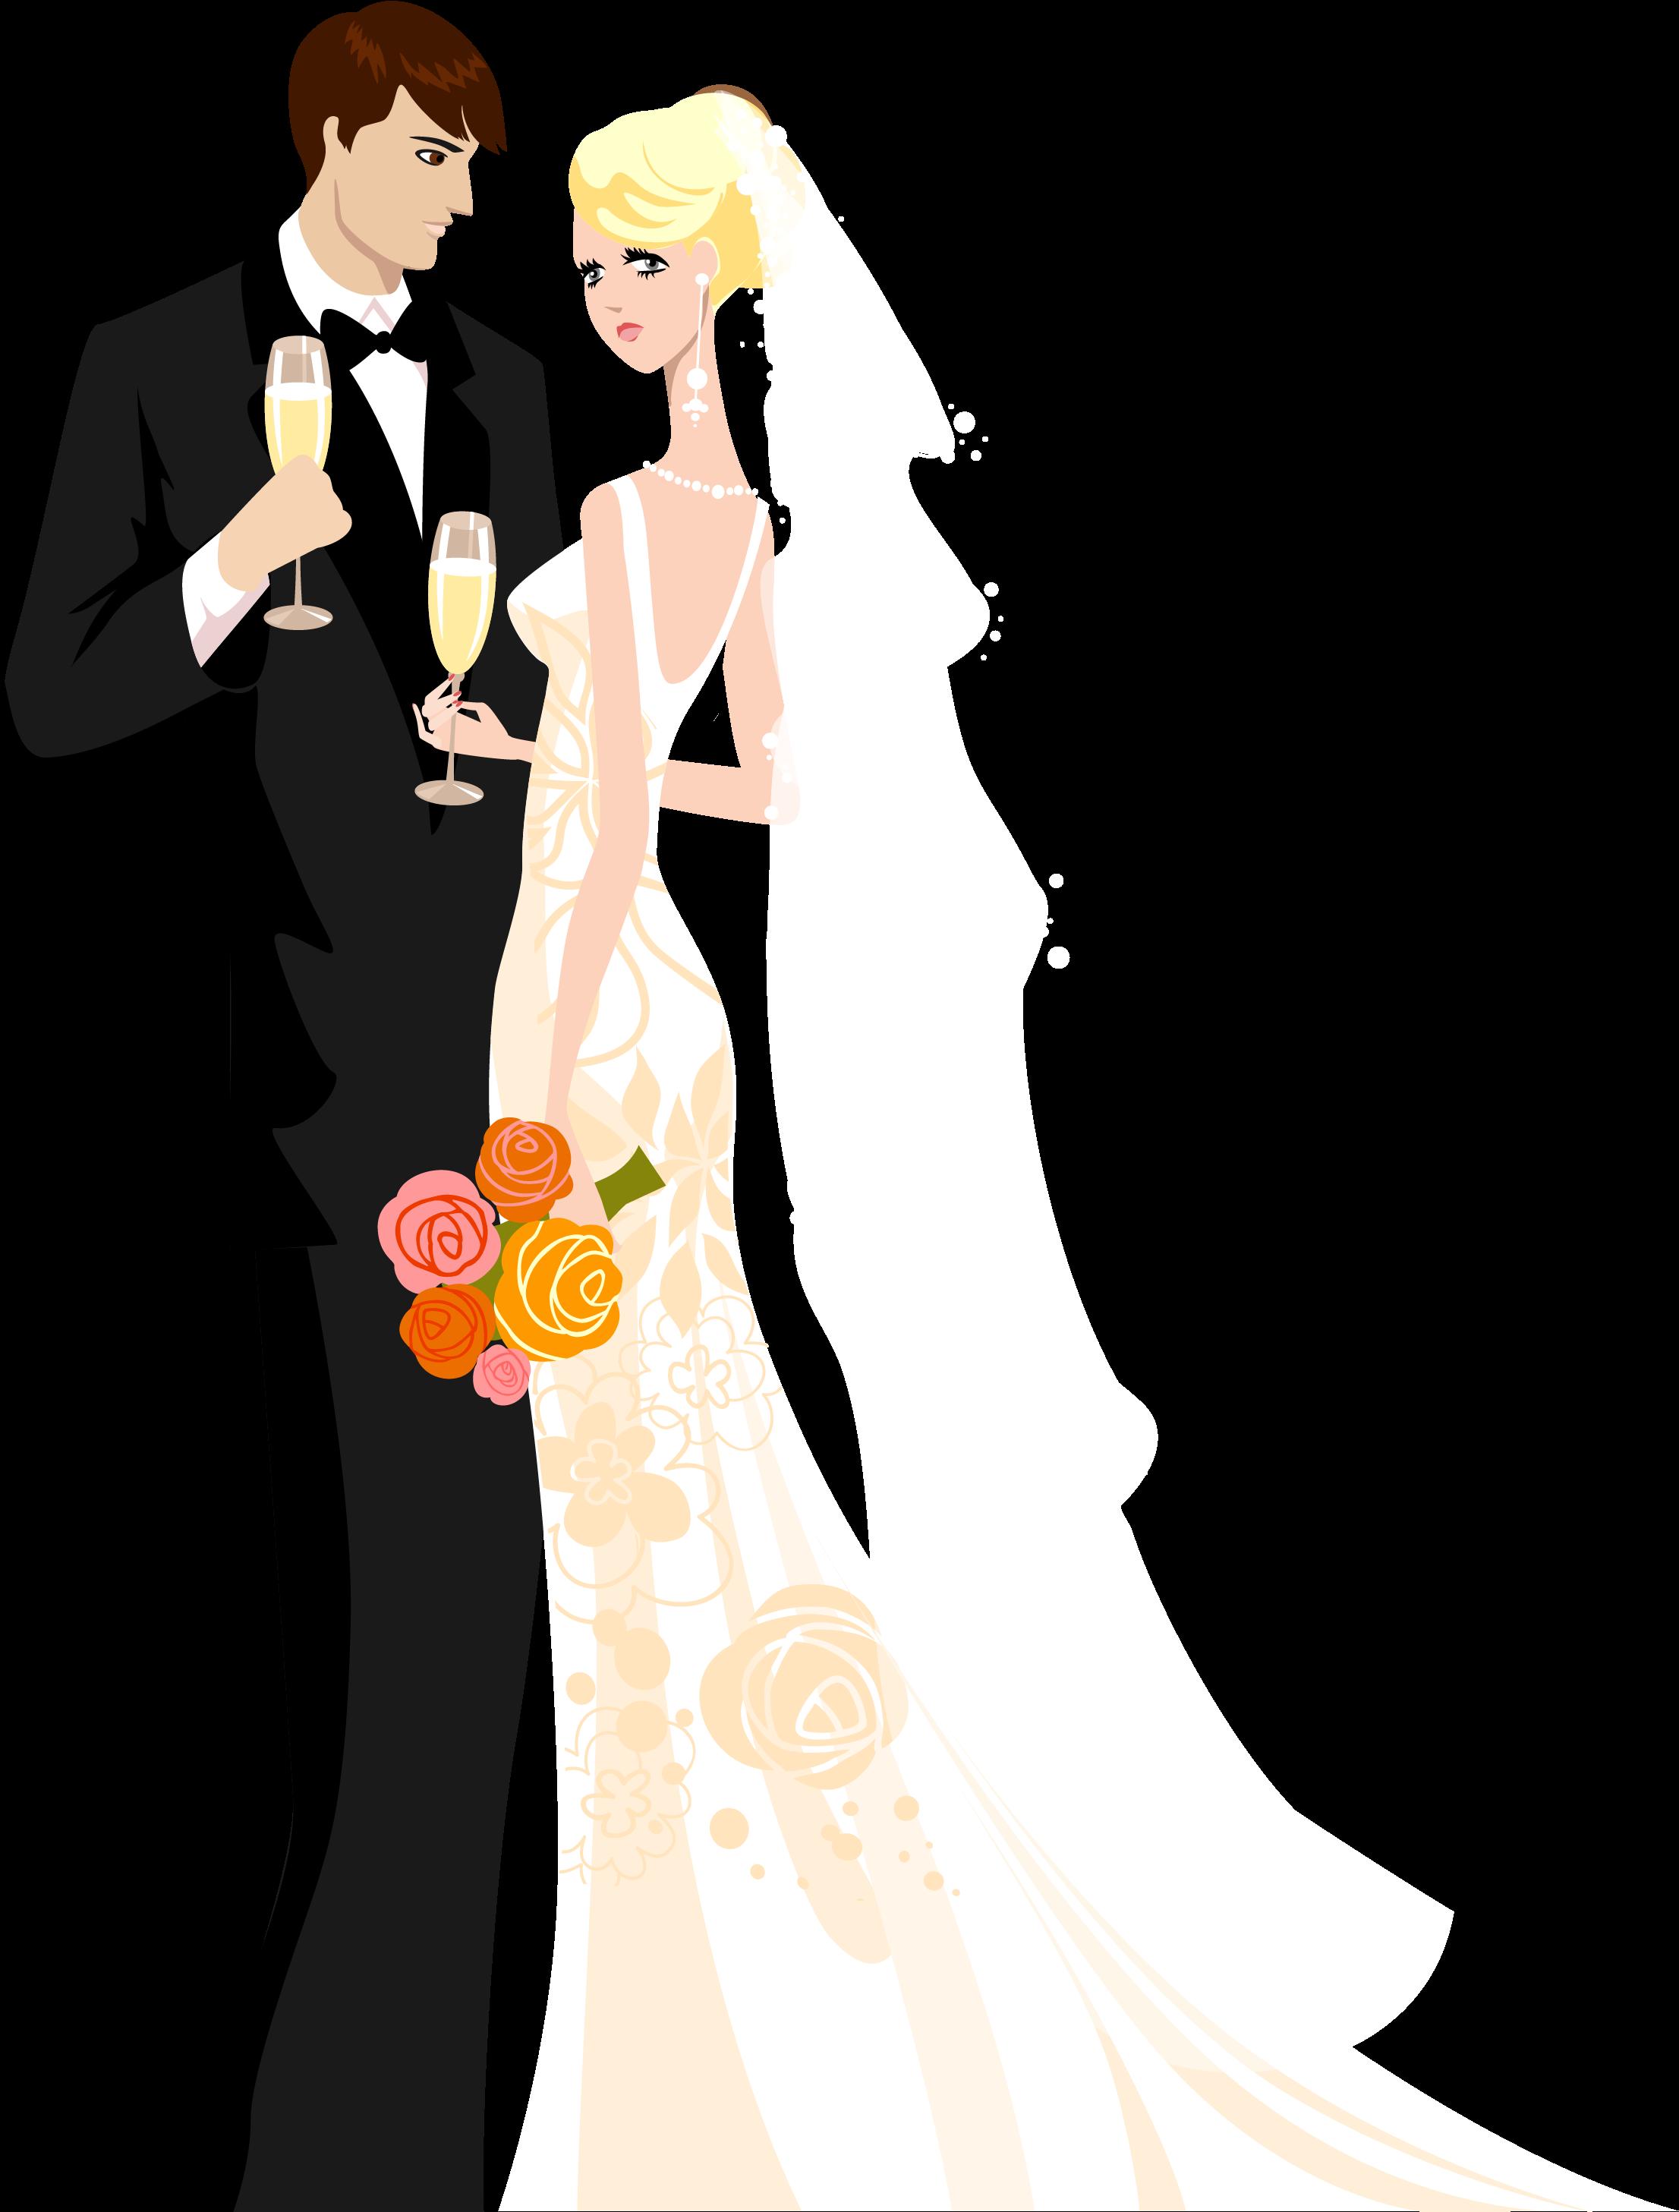 Bride Groom Clipart